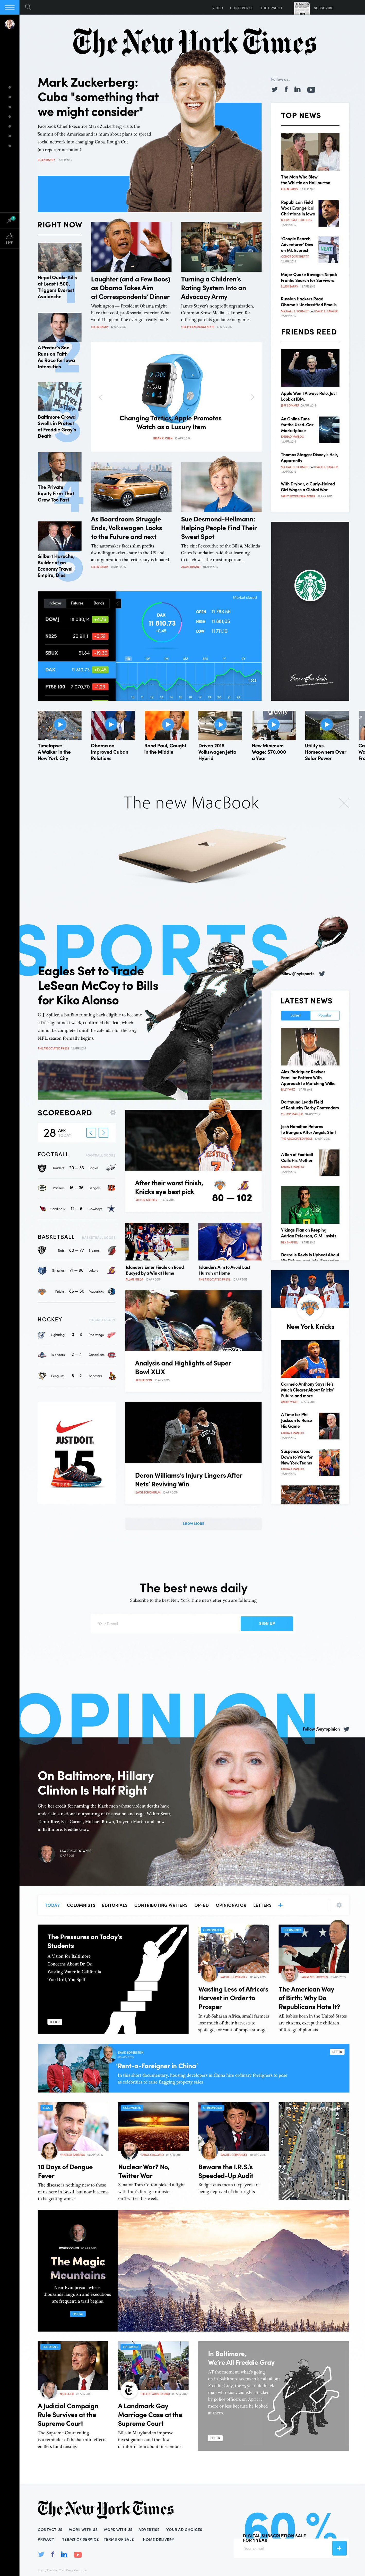 Web Site Concept Nytimes New York Times Digital Magazine Newspaper News Bright News Web Design Web App Design Unique Web Design